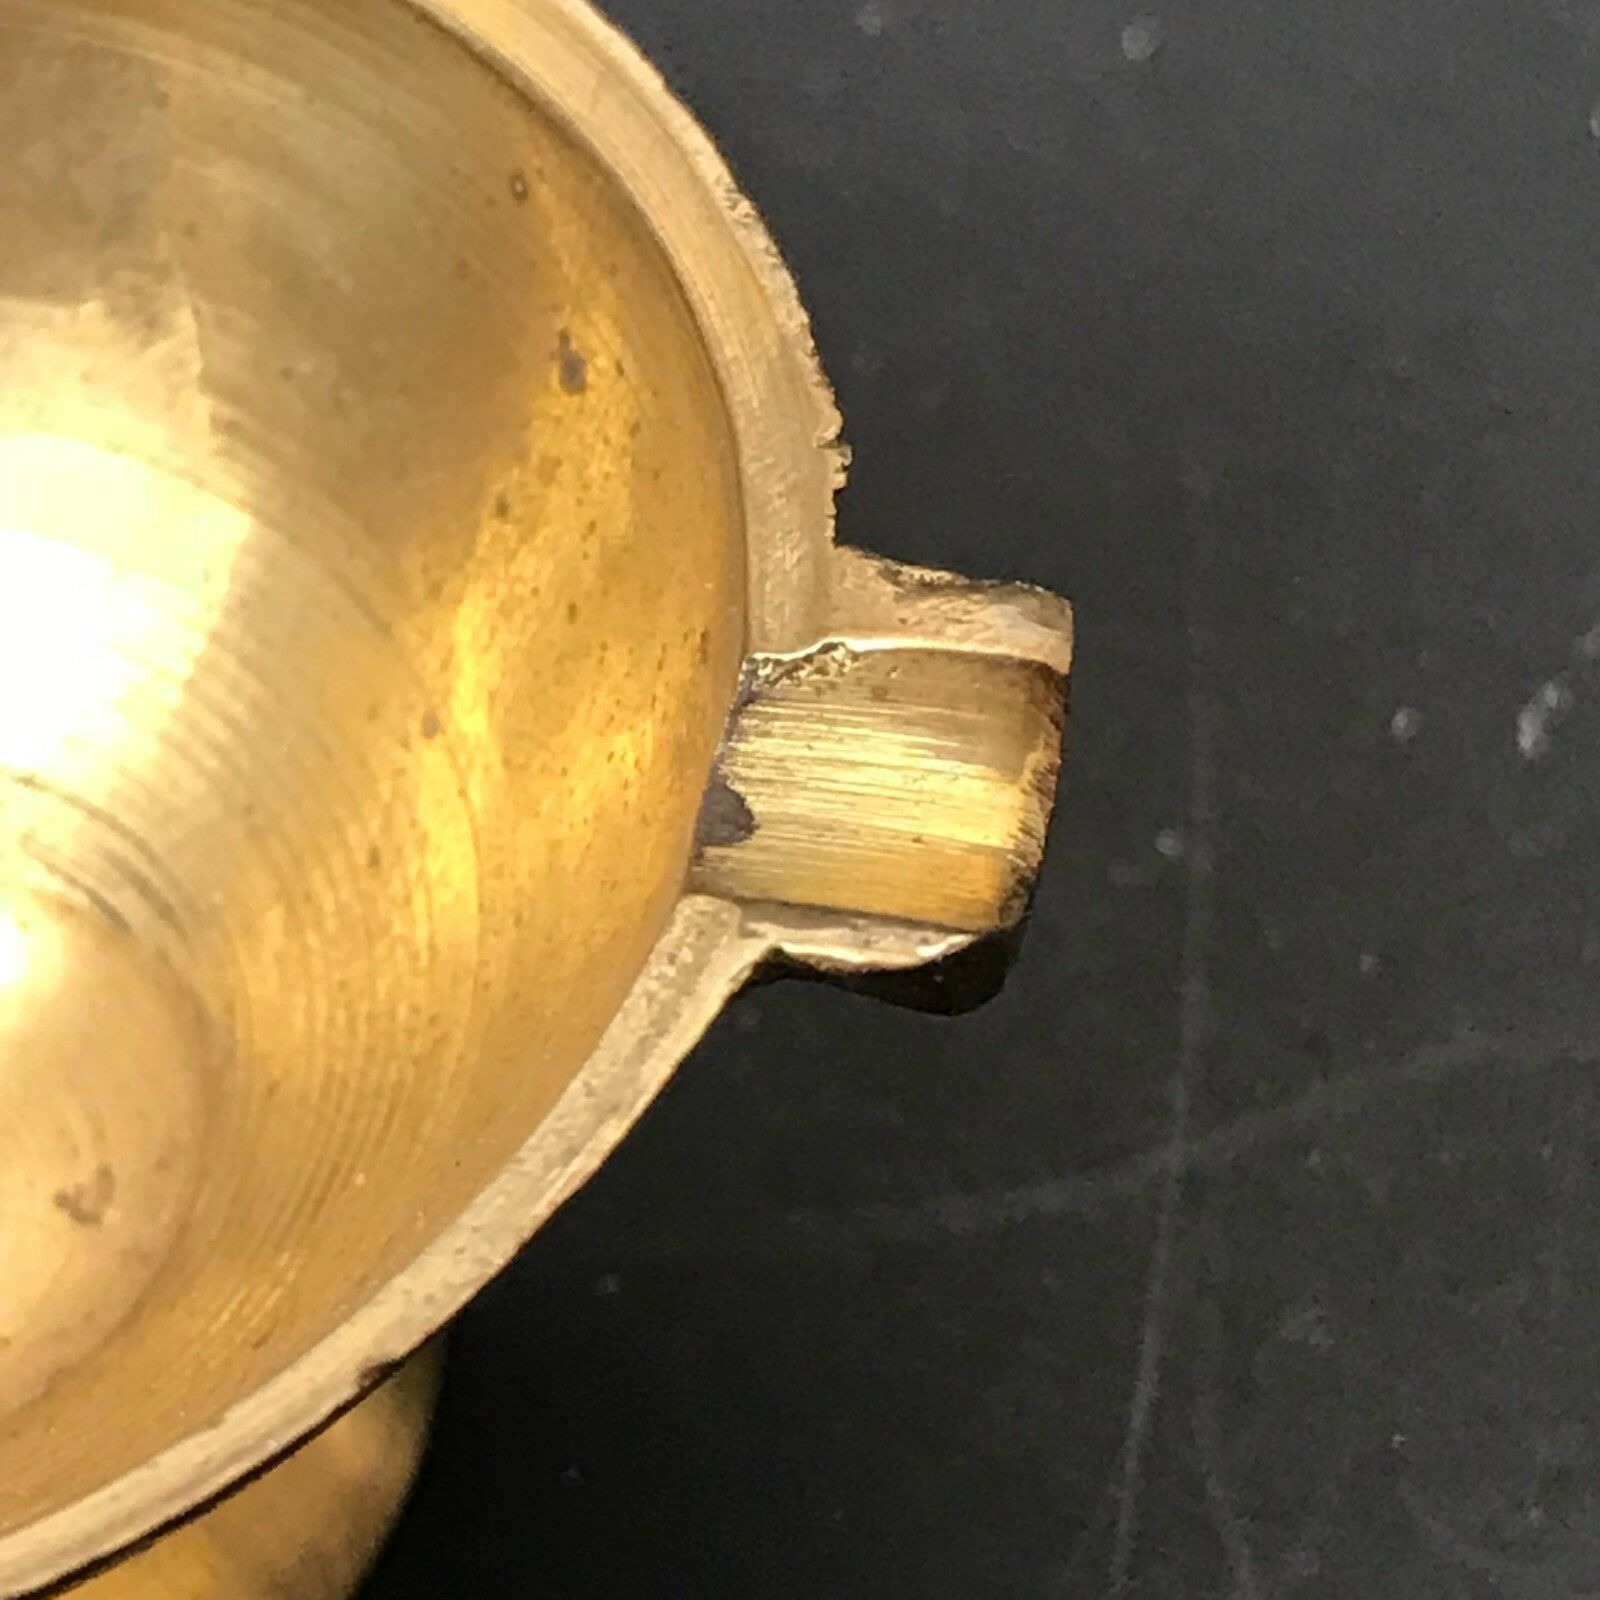 Vintage Miniature Brass Ornament Christmas Mini Ashtray With Handle Gold Patina image 7